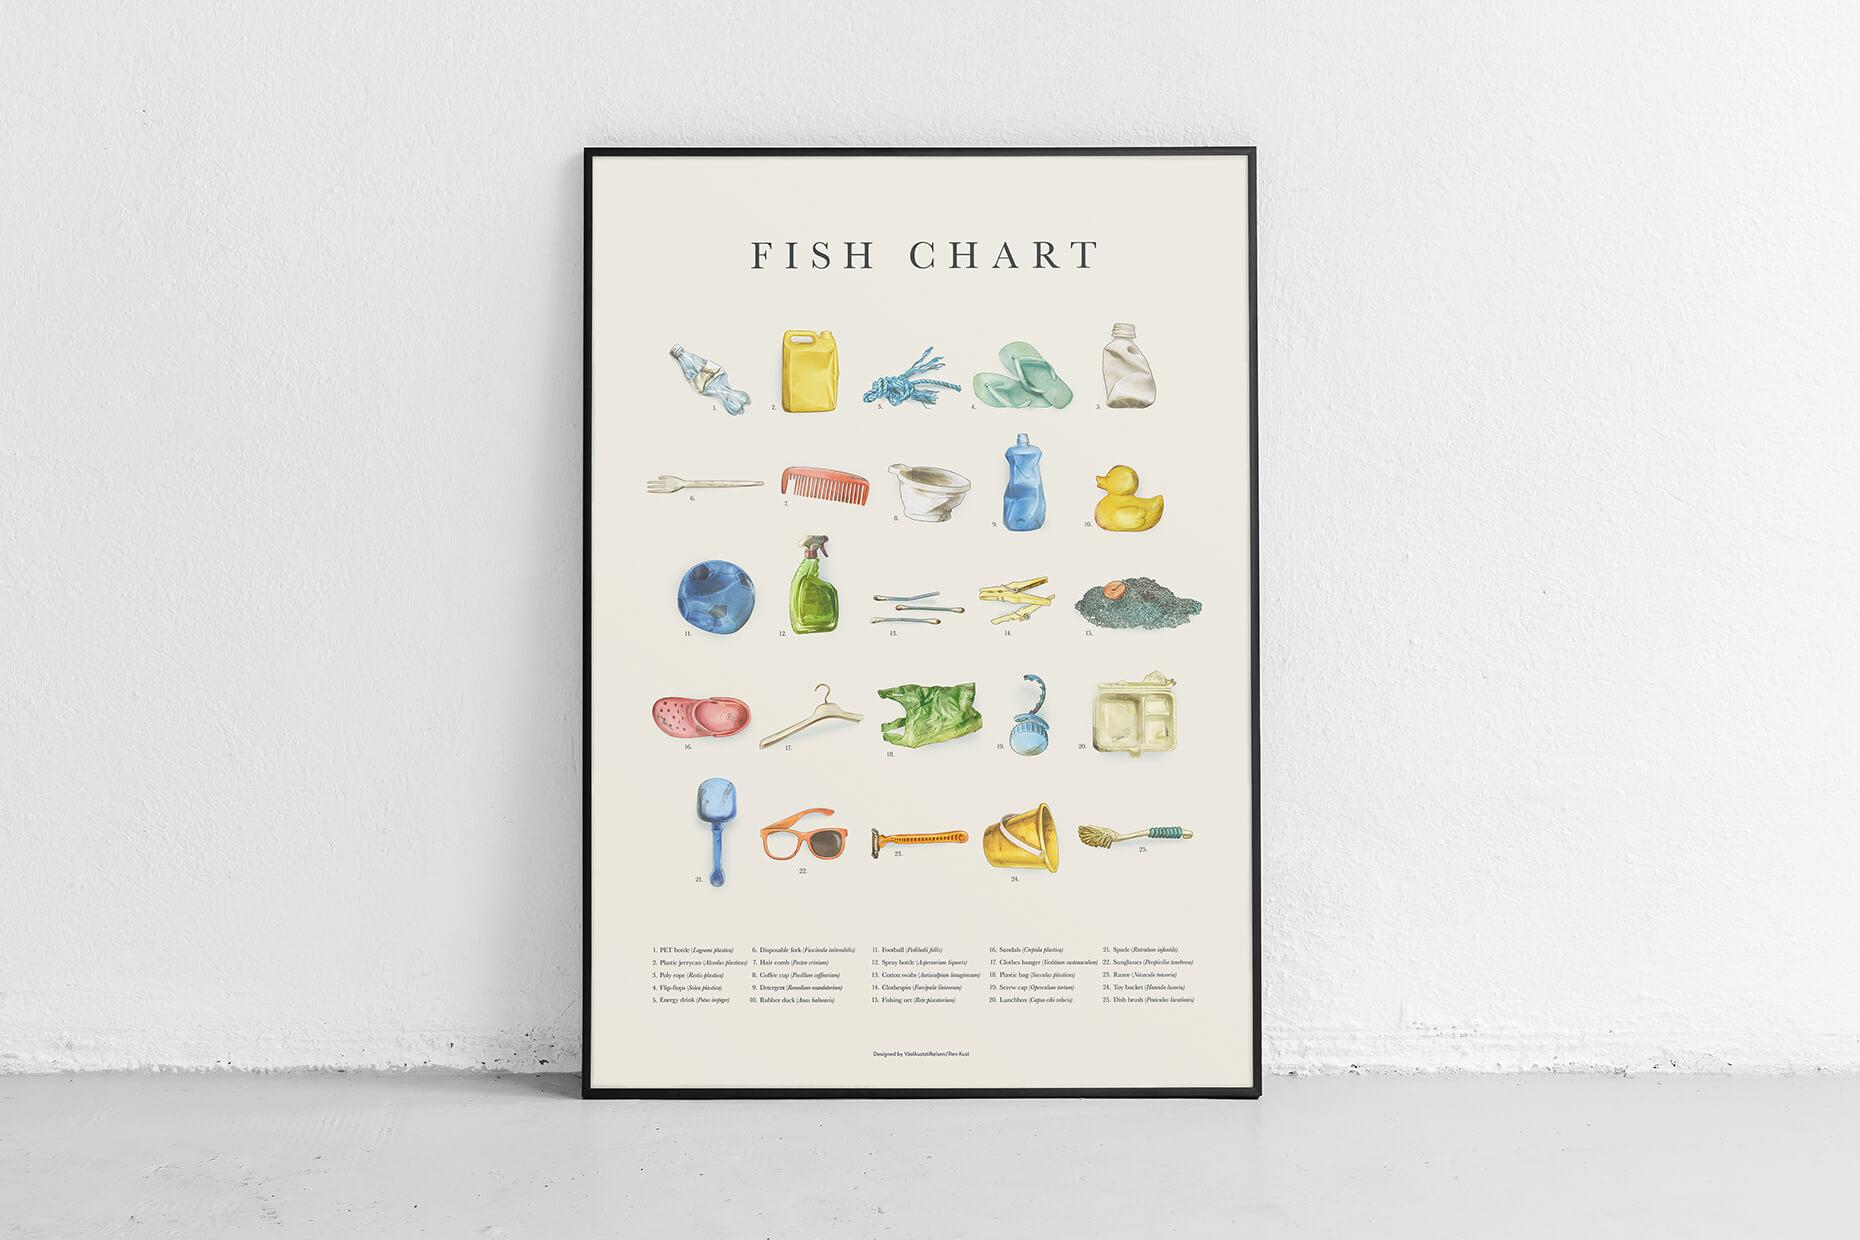 Fishchart_04